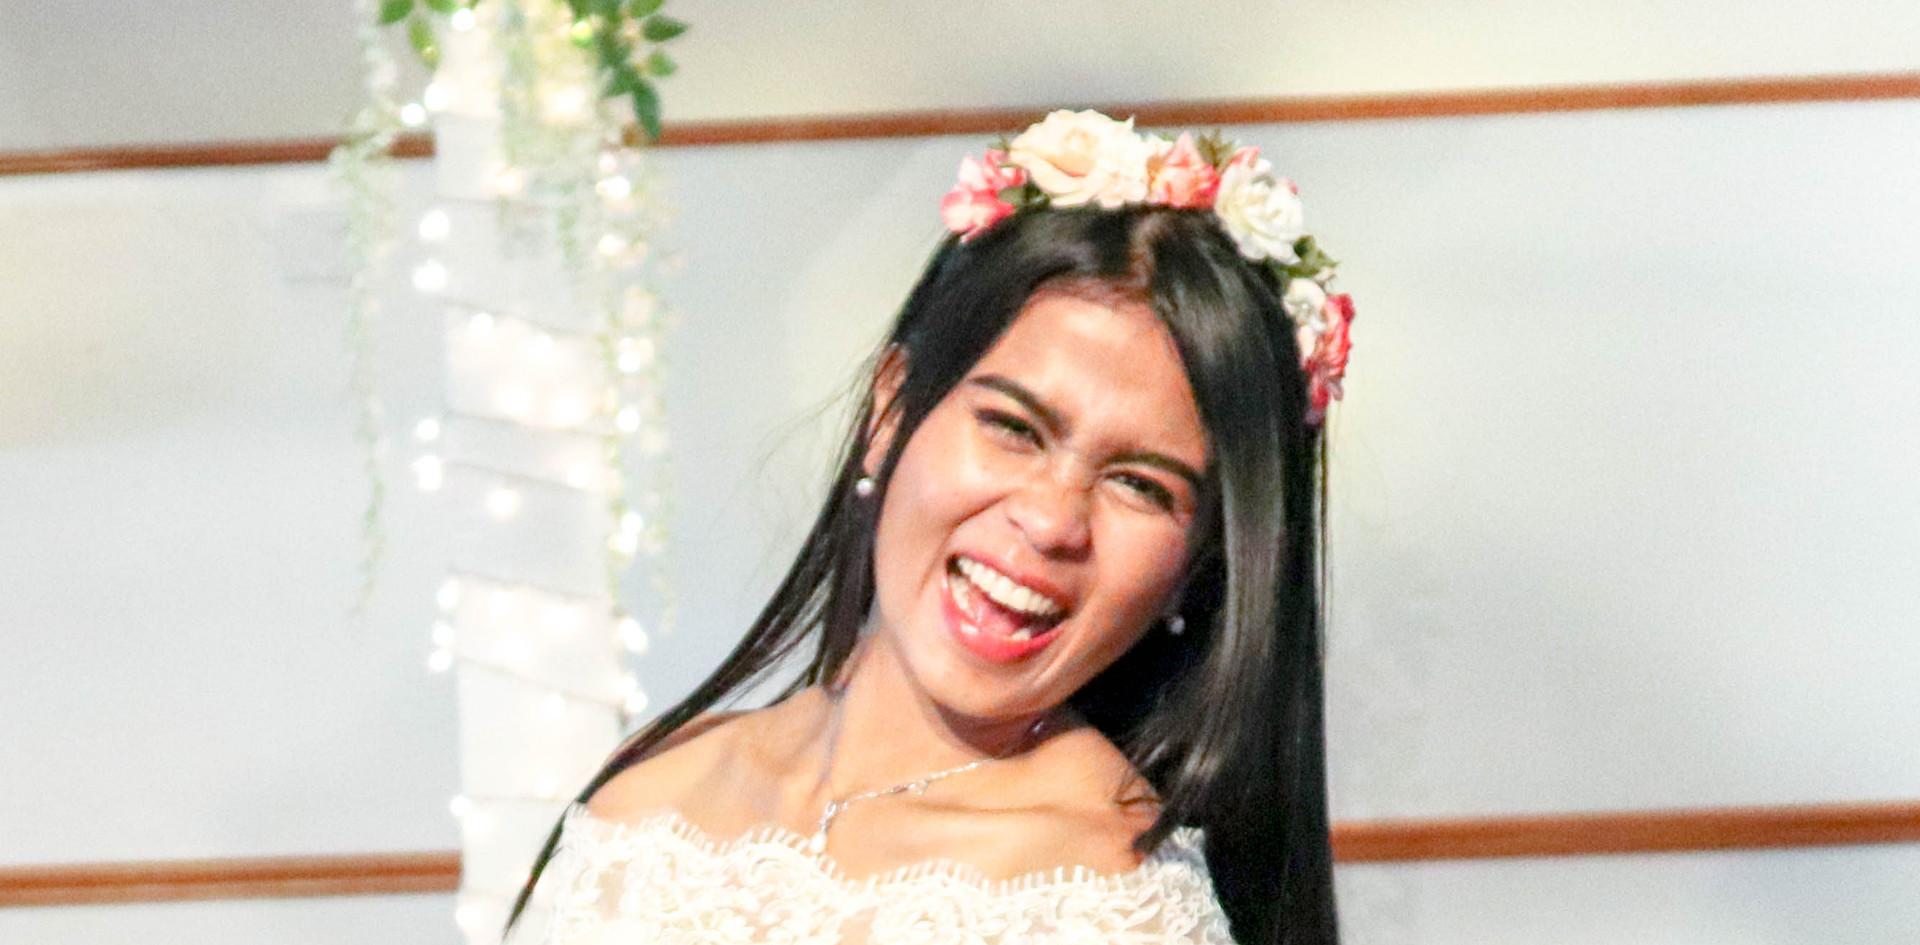 bride-smile-happy-love.jpg